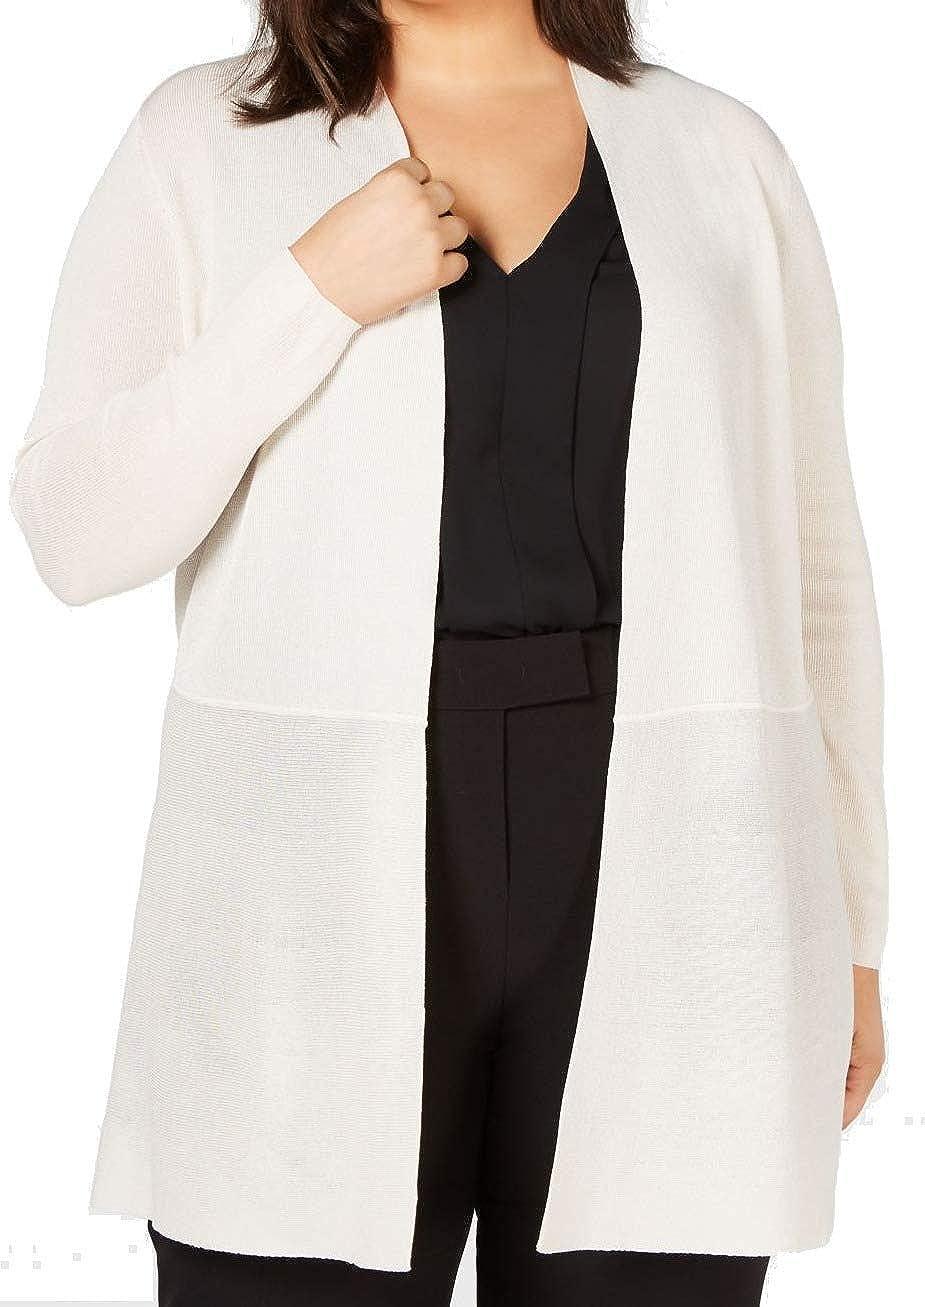 Anne Klein Women's Size Plus Long Cardigan